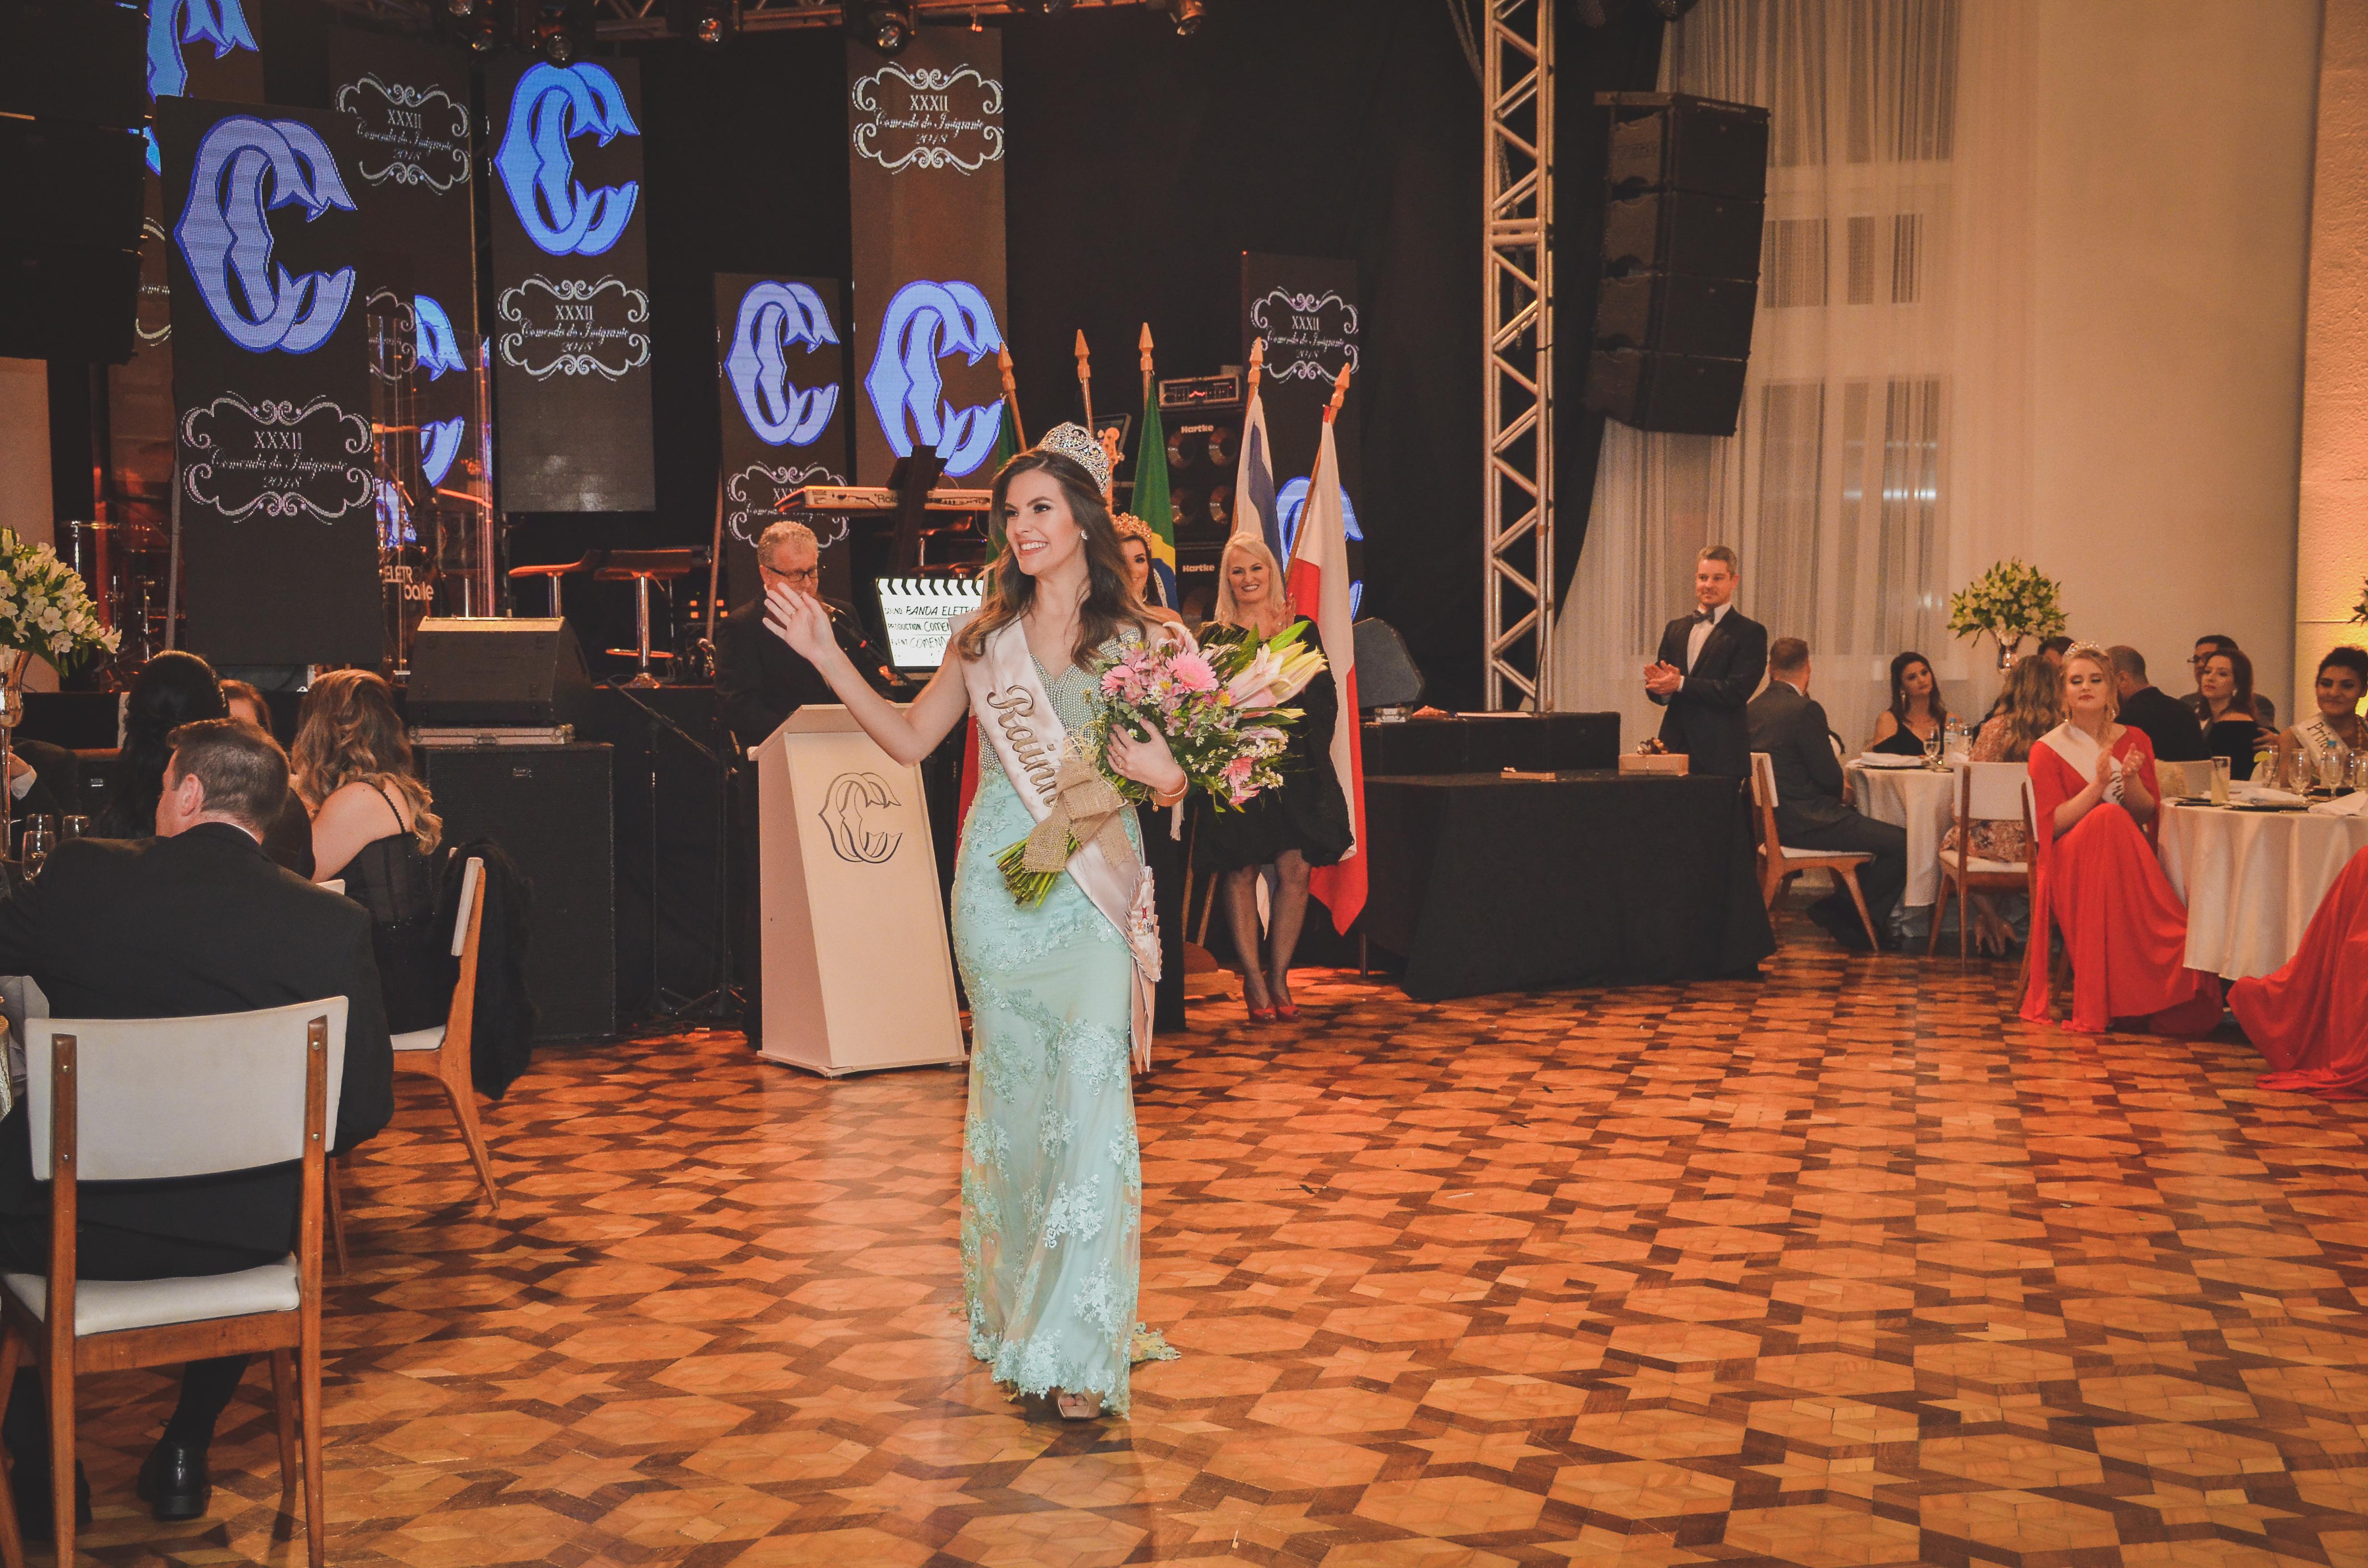 Rainha da Frinape 2018, Talita Lorenzetti, desfilando no CC